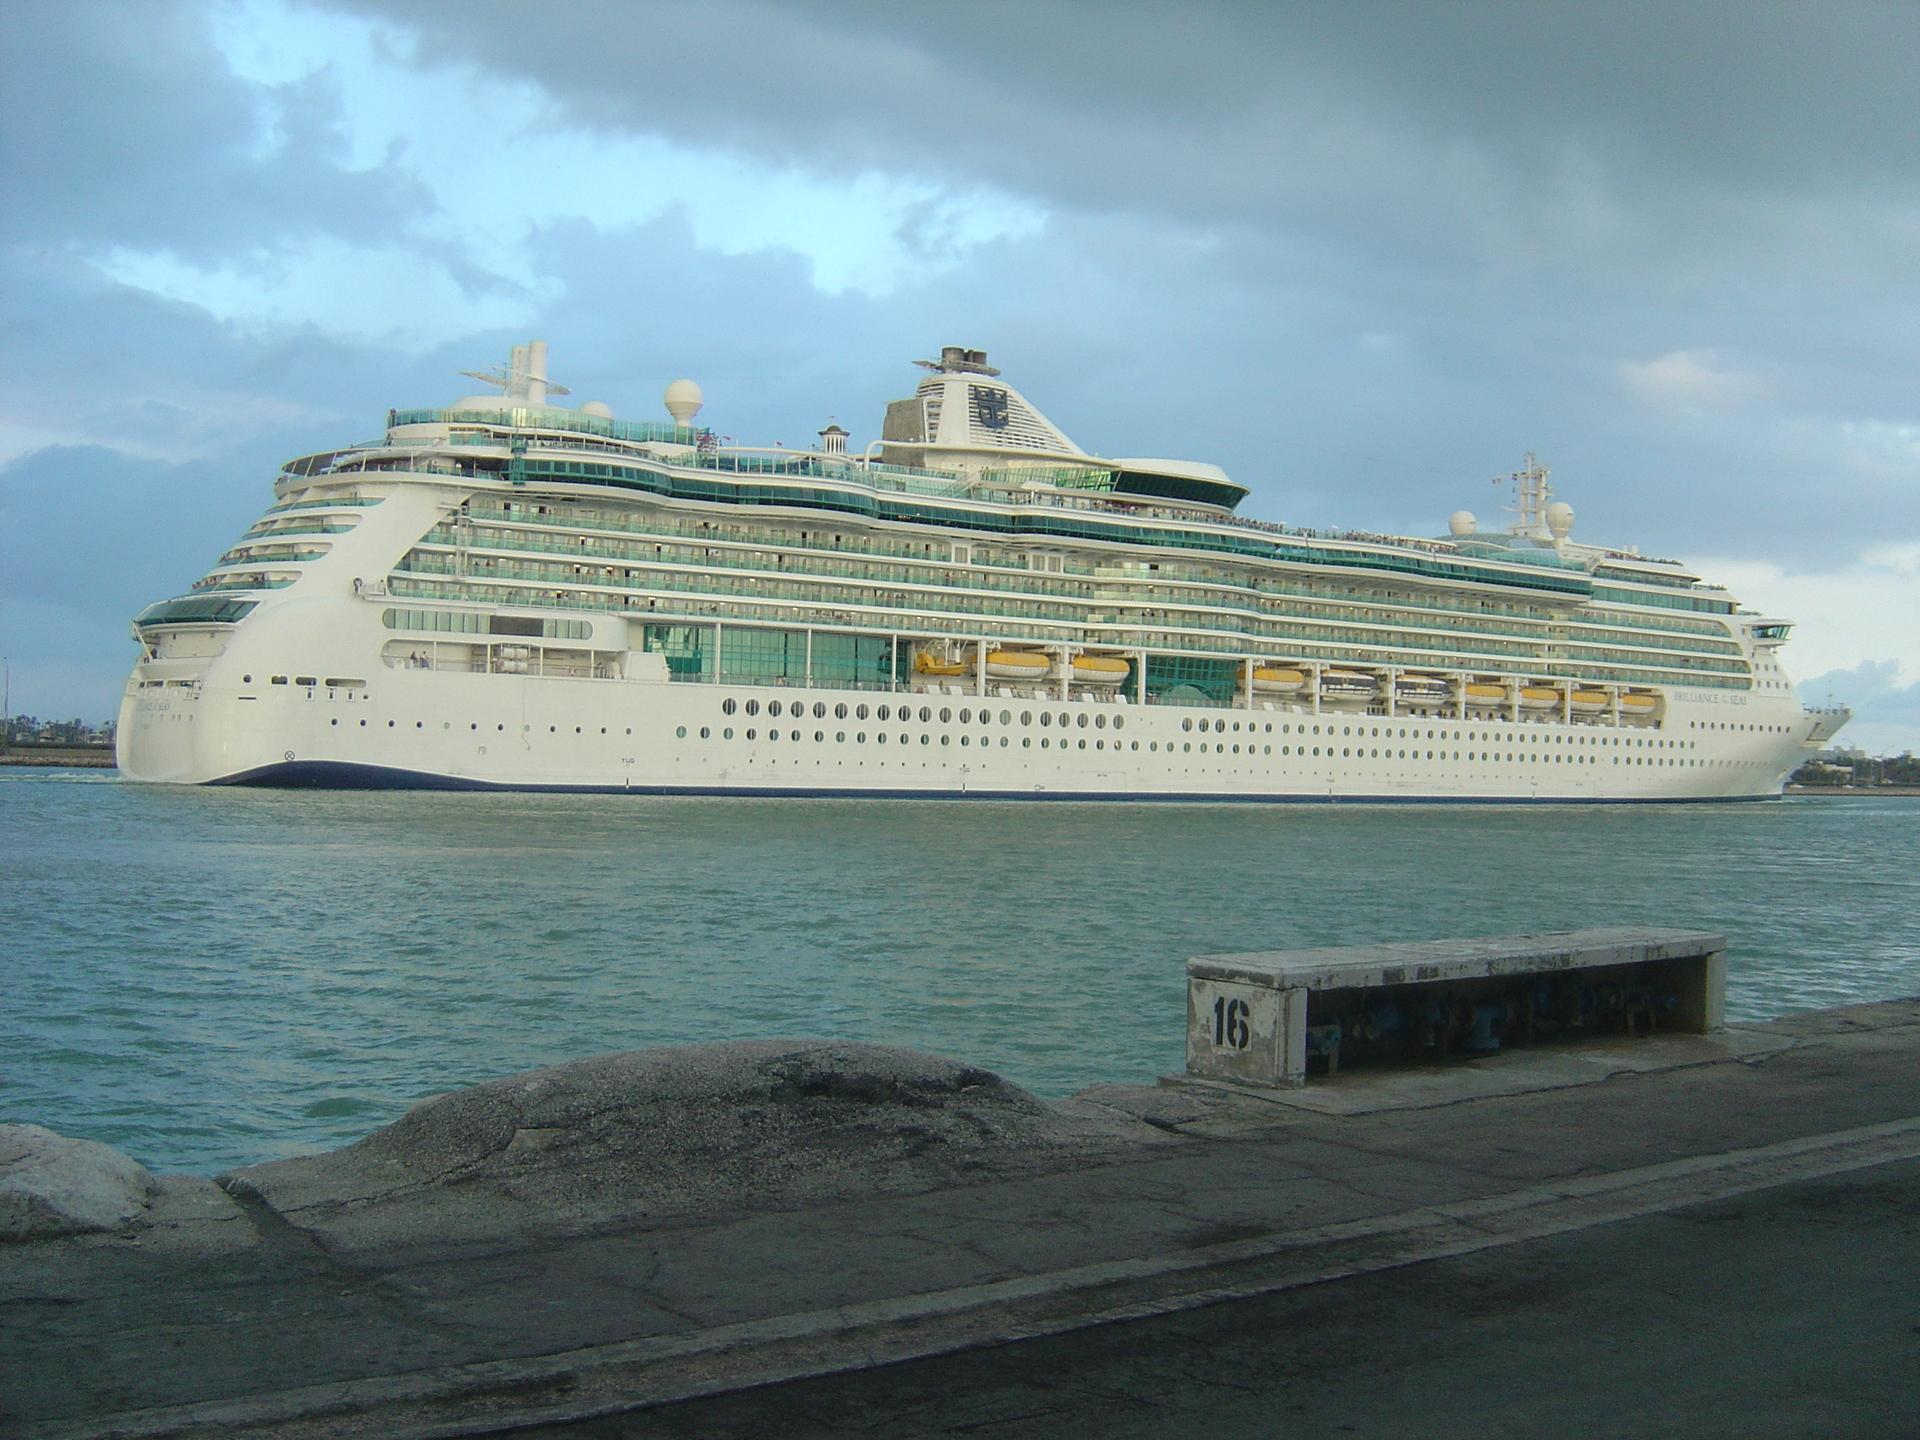 Cruise Ship  Miami Photo 353417  Fanpop